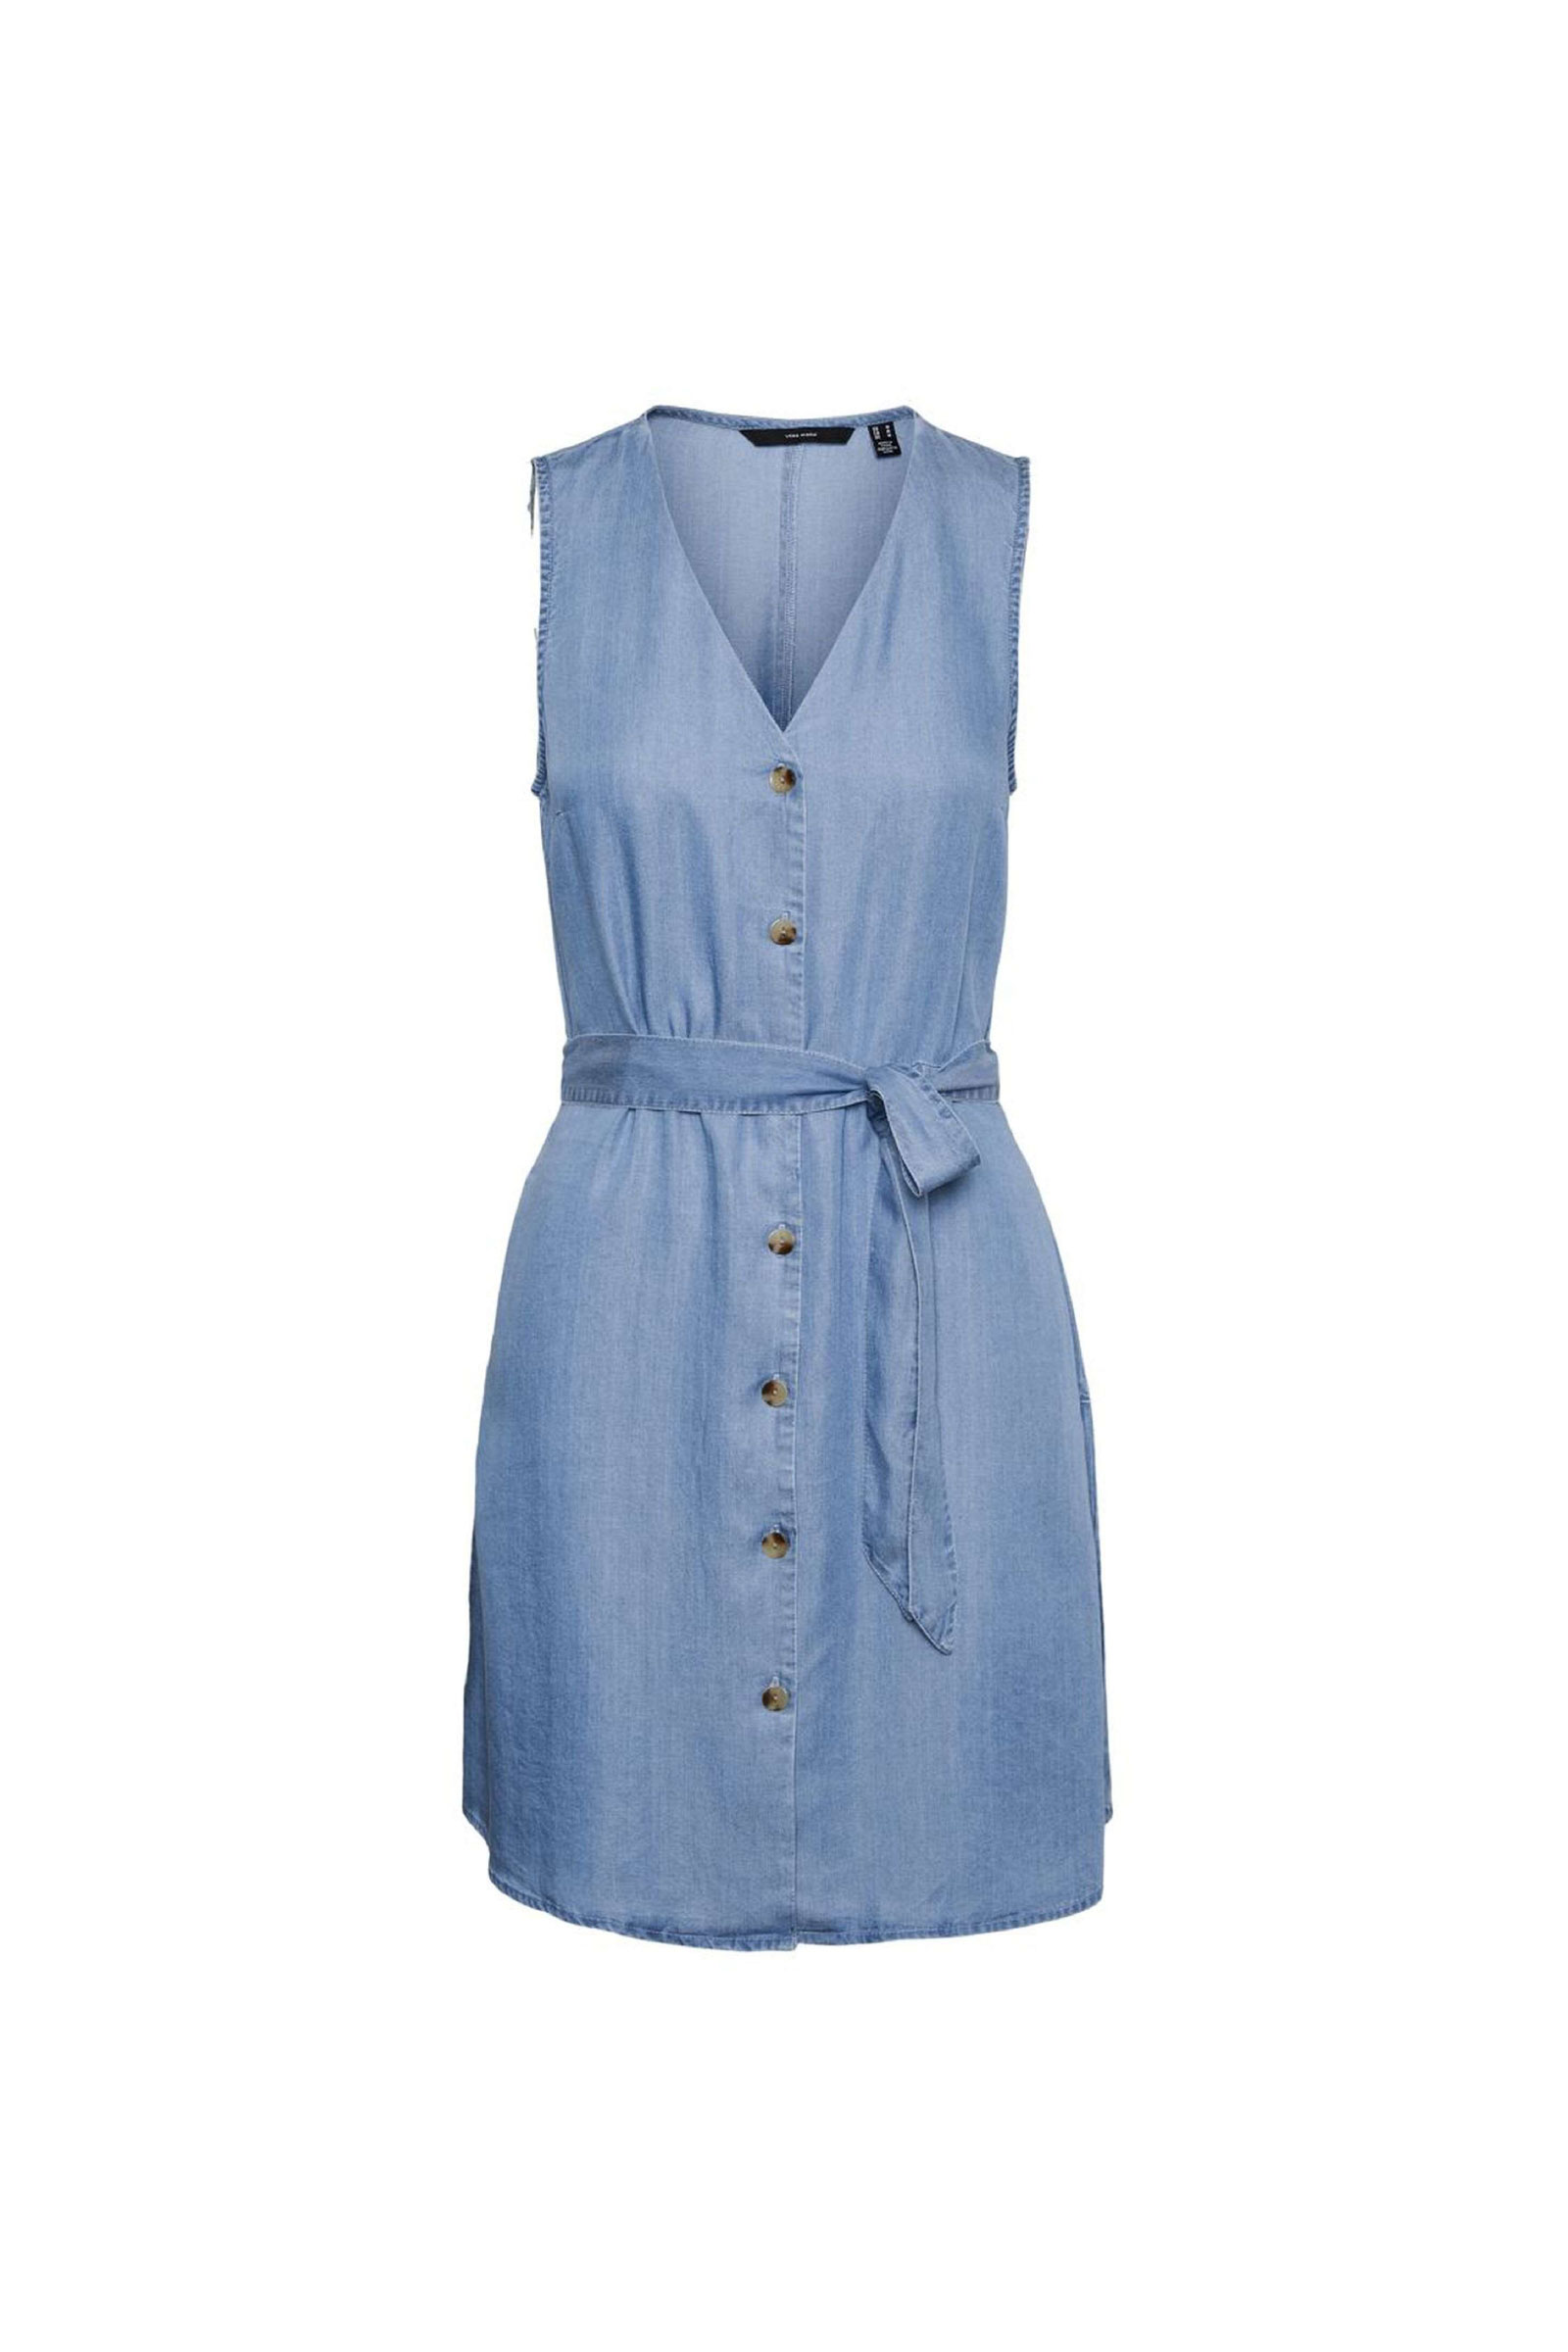 VERO MODA Woman Dress VERO MODA | Dress | 10247808Light Blue Denim